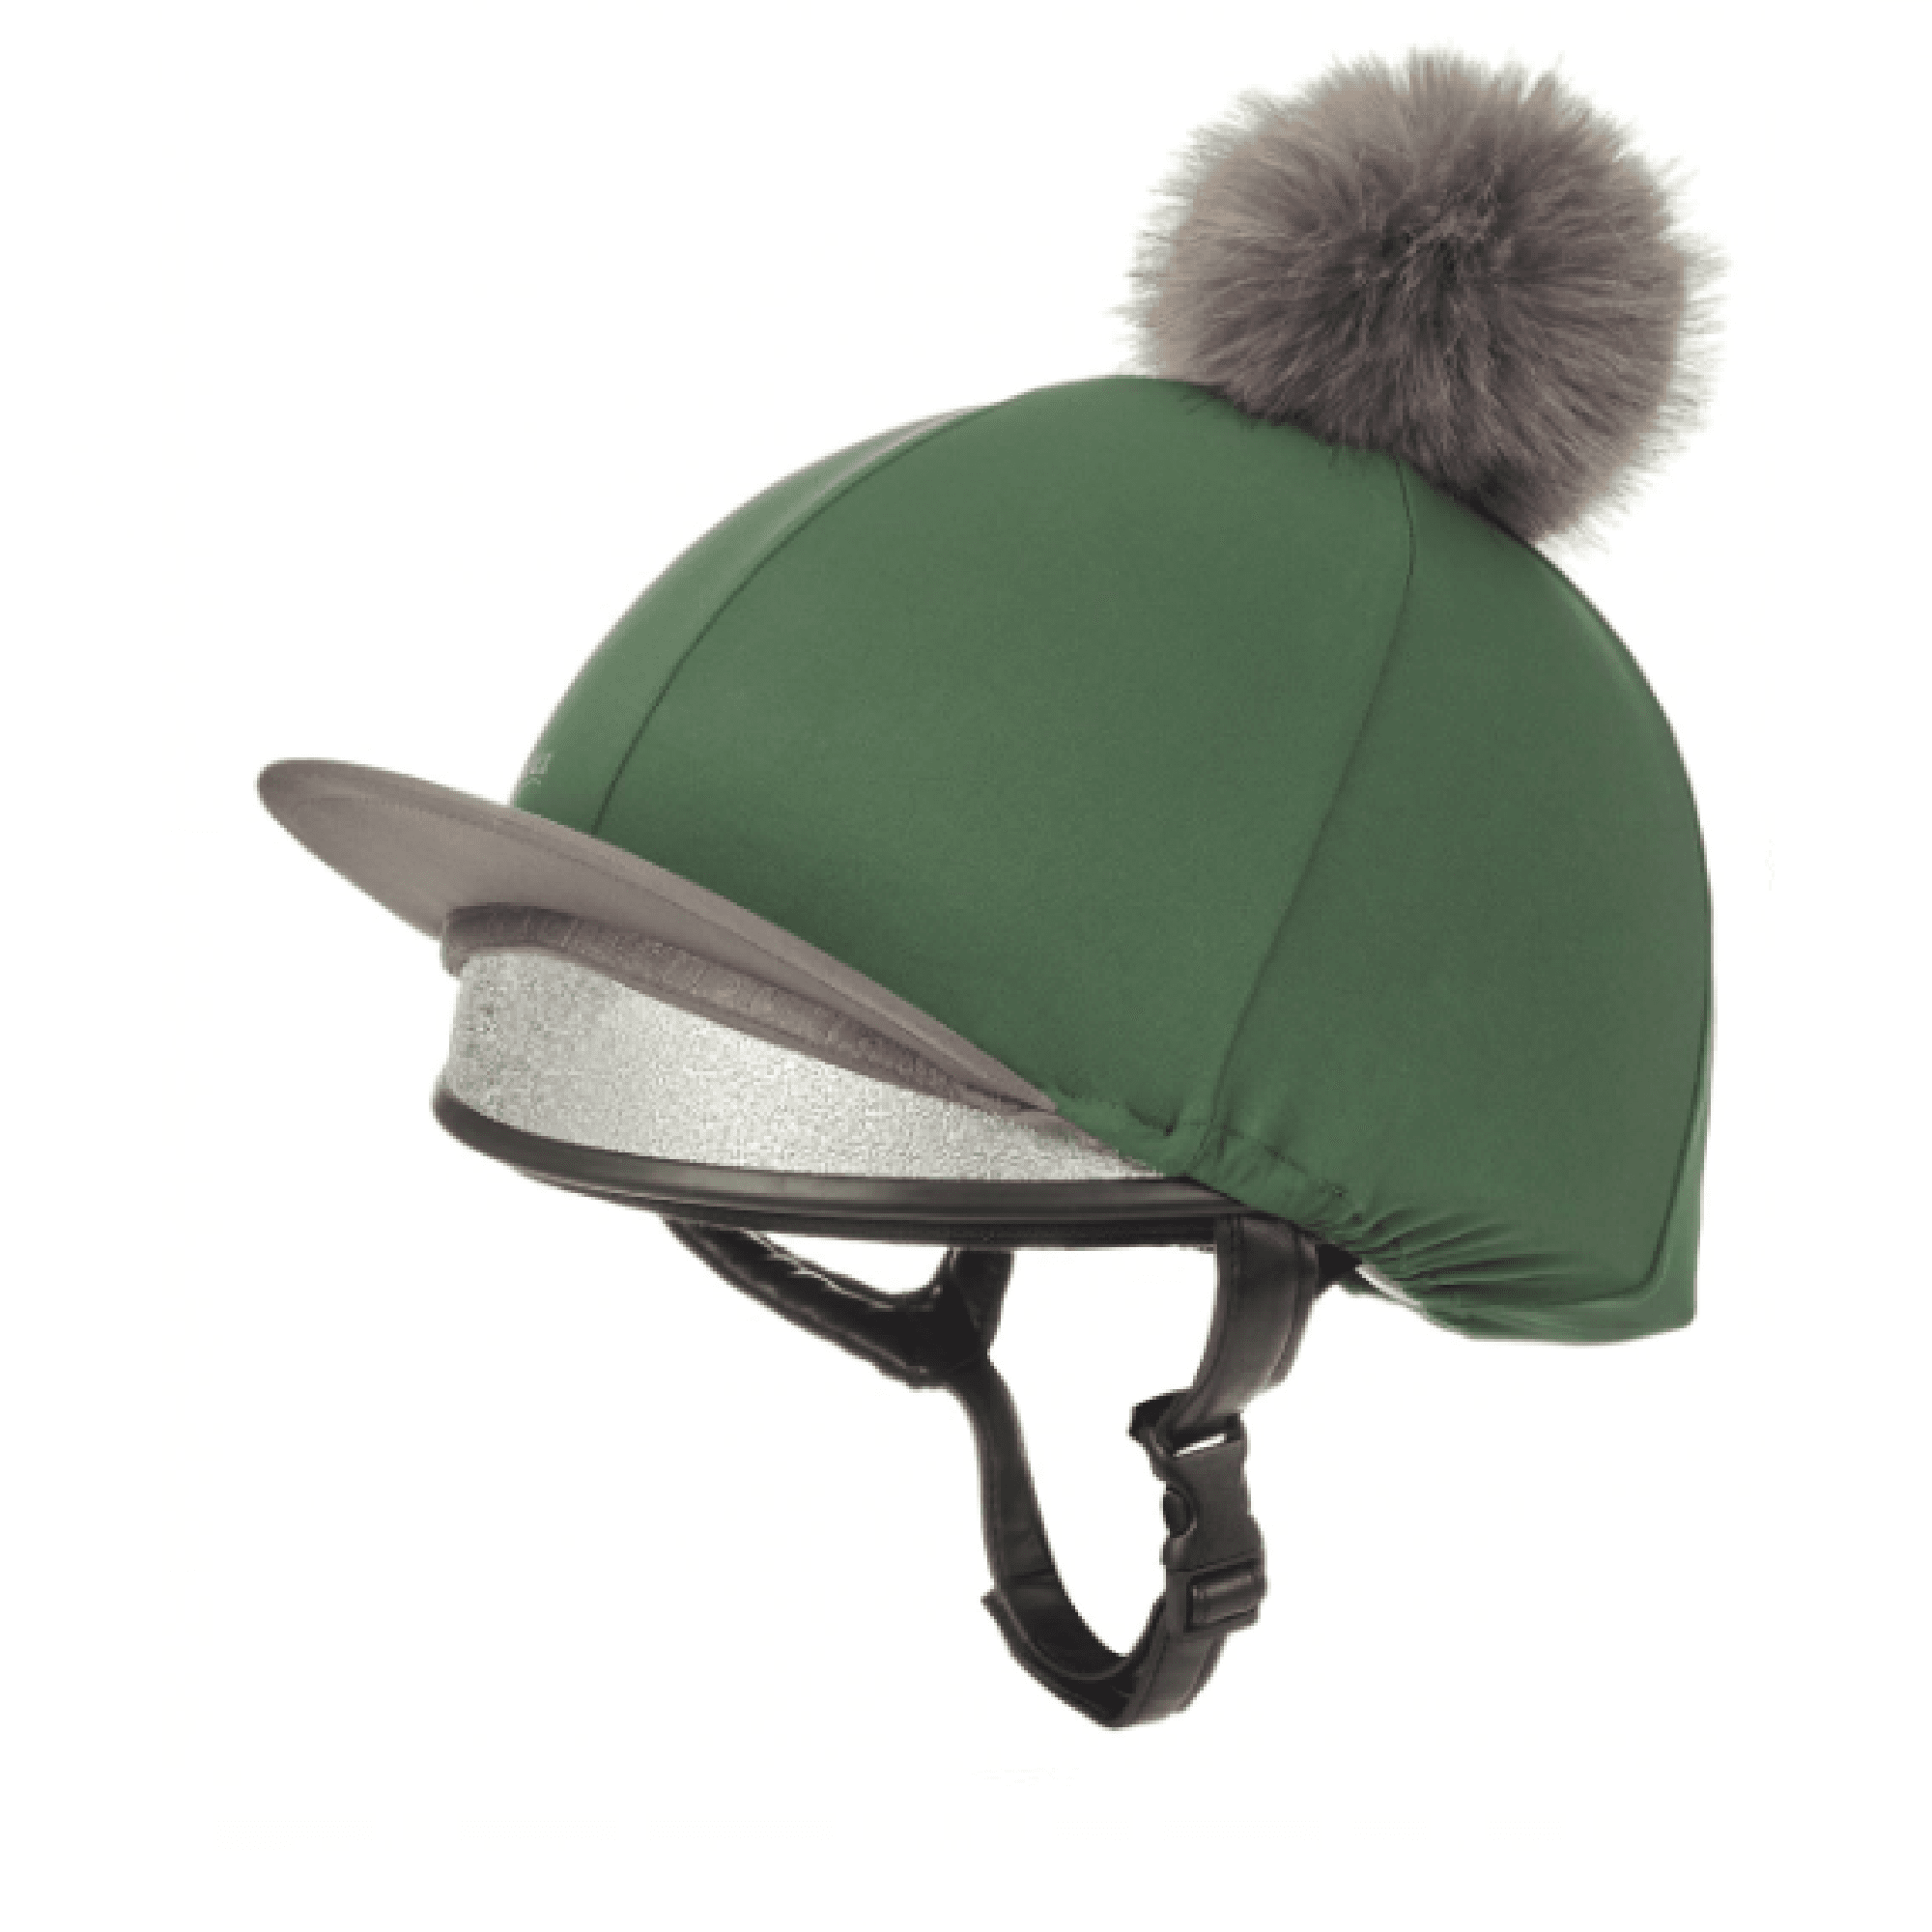 My-LeMieux-Hat-Silk-Luxury-Skull-Riding-Hat-Silk-Cover-with-Detachable-Pom-Pom thumbnail 28